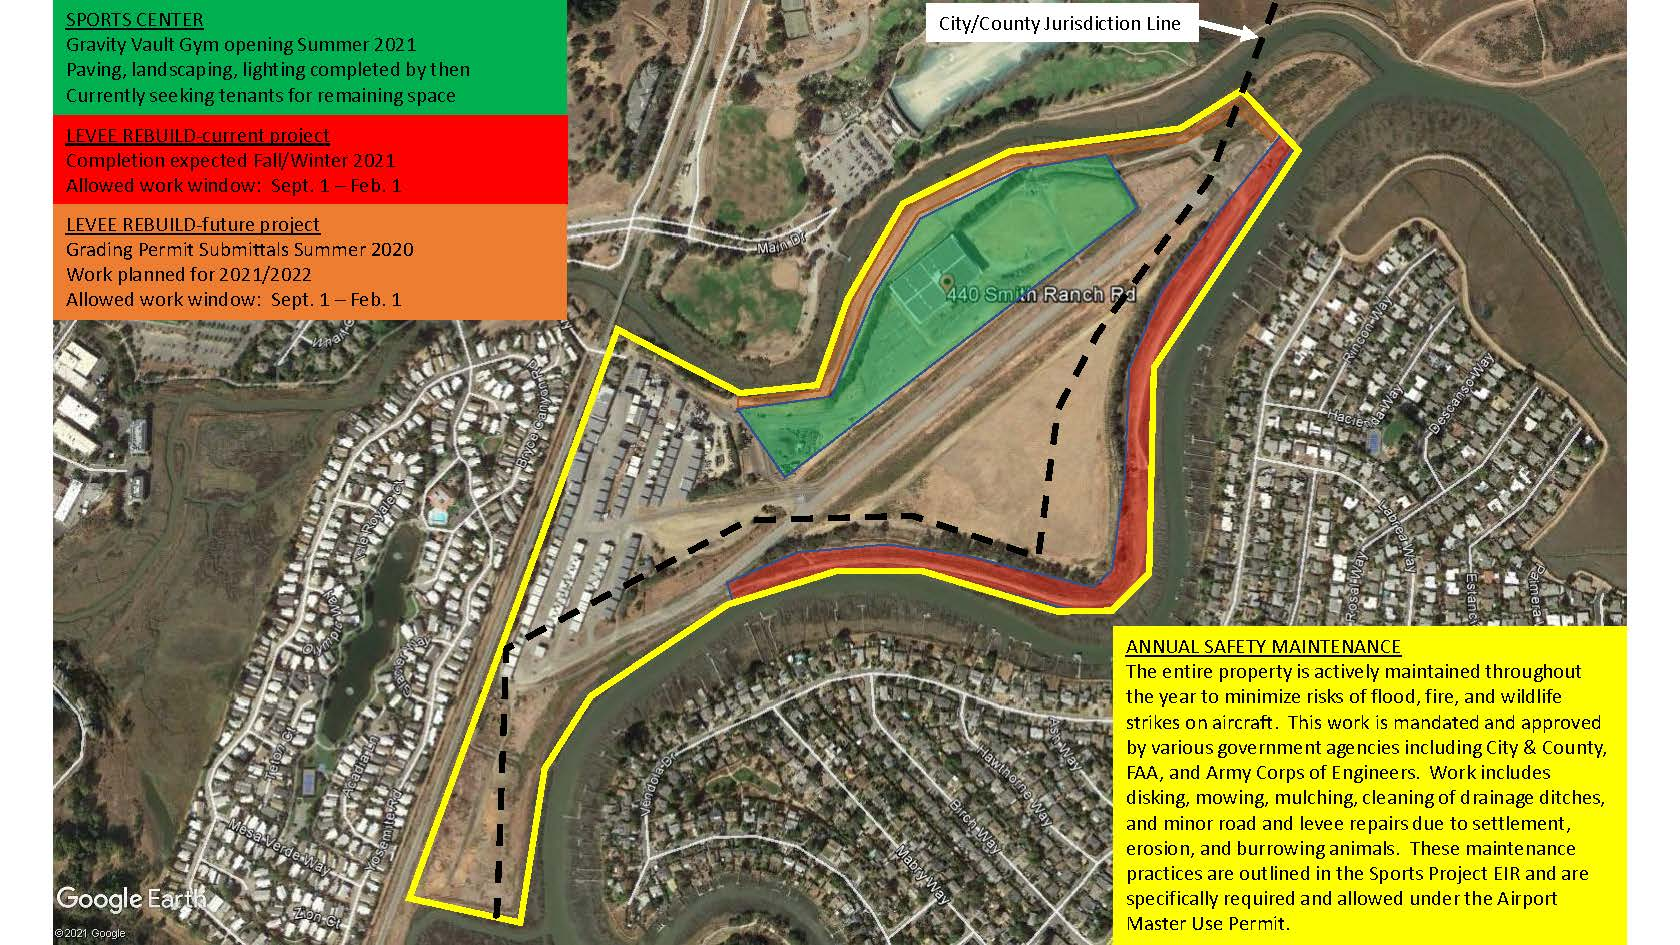 Airport Construction & Maintenance Map